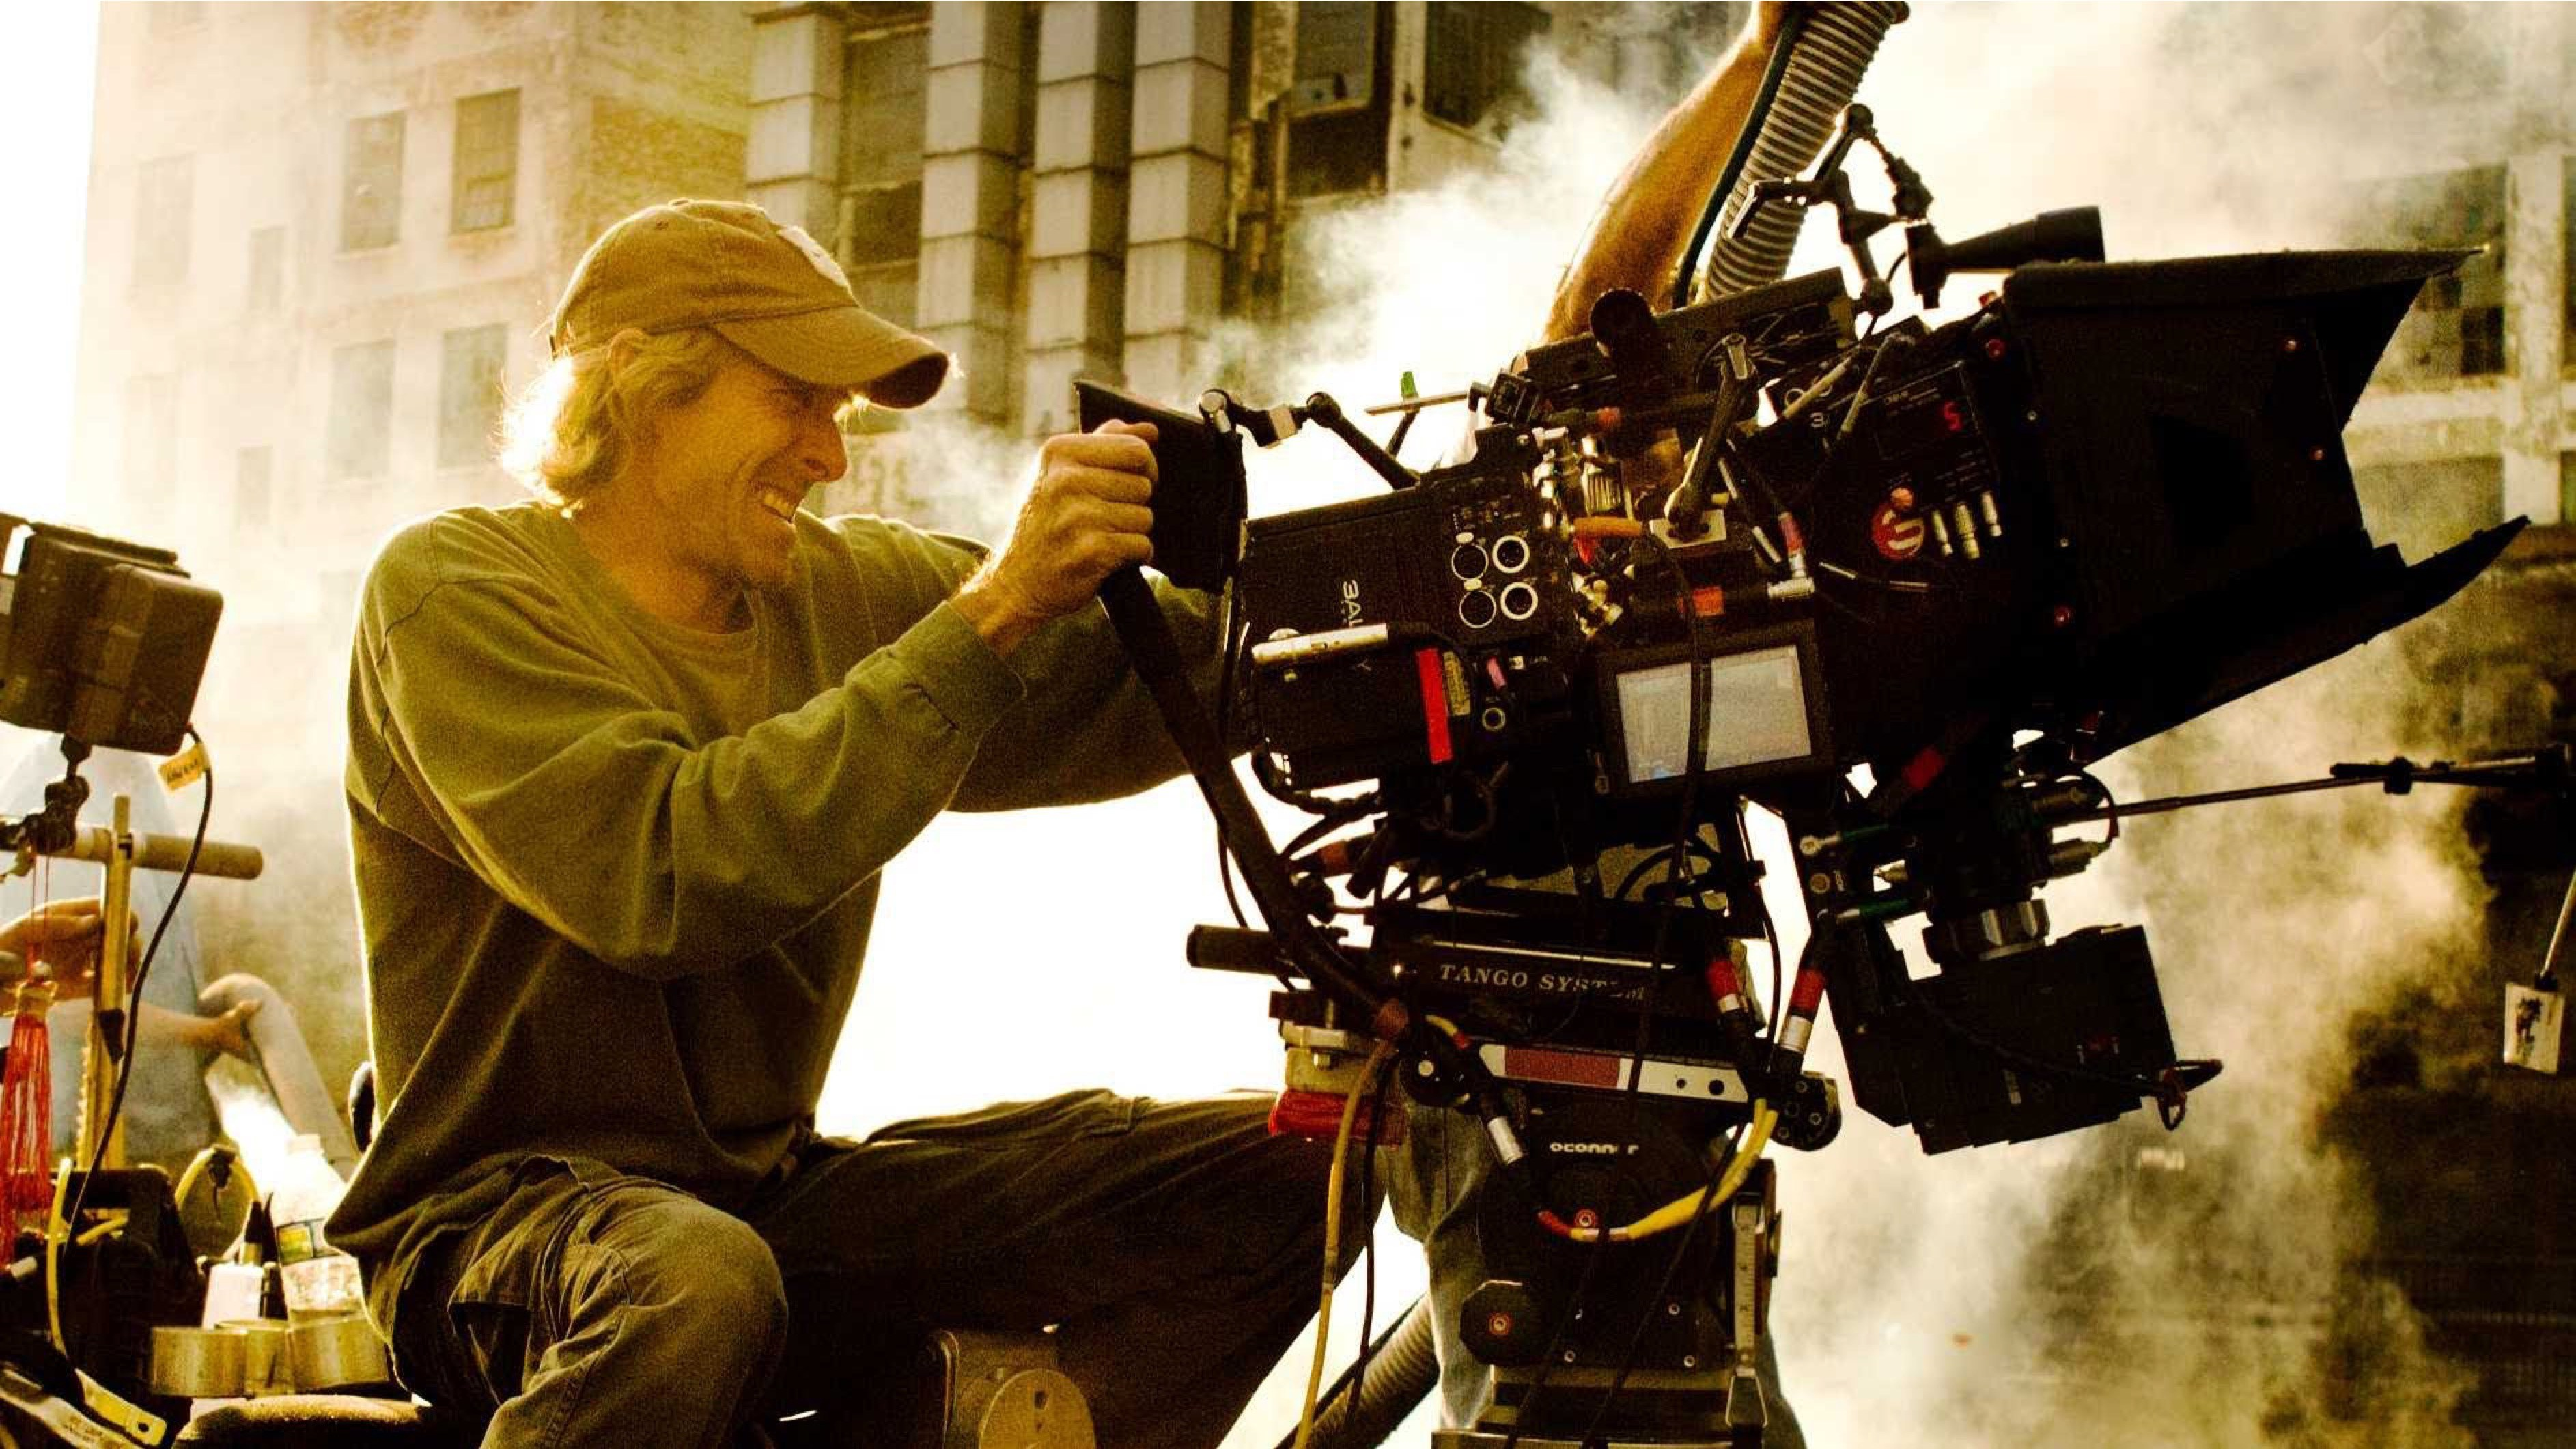 The next Transformers film draped Winston Churchill's